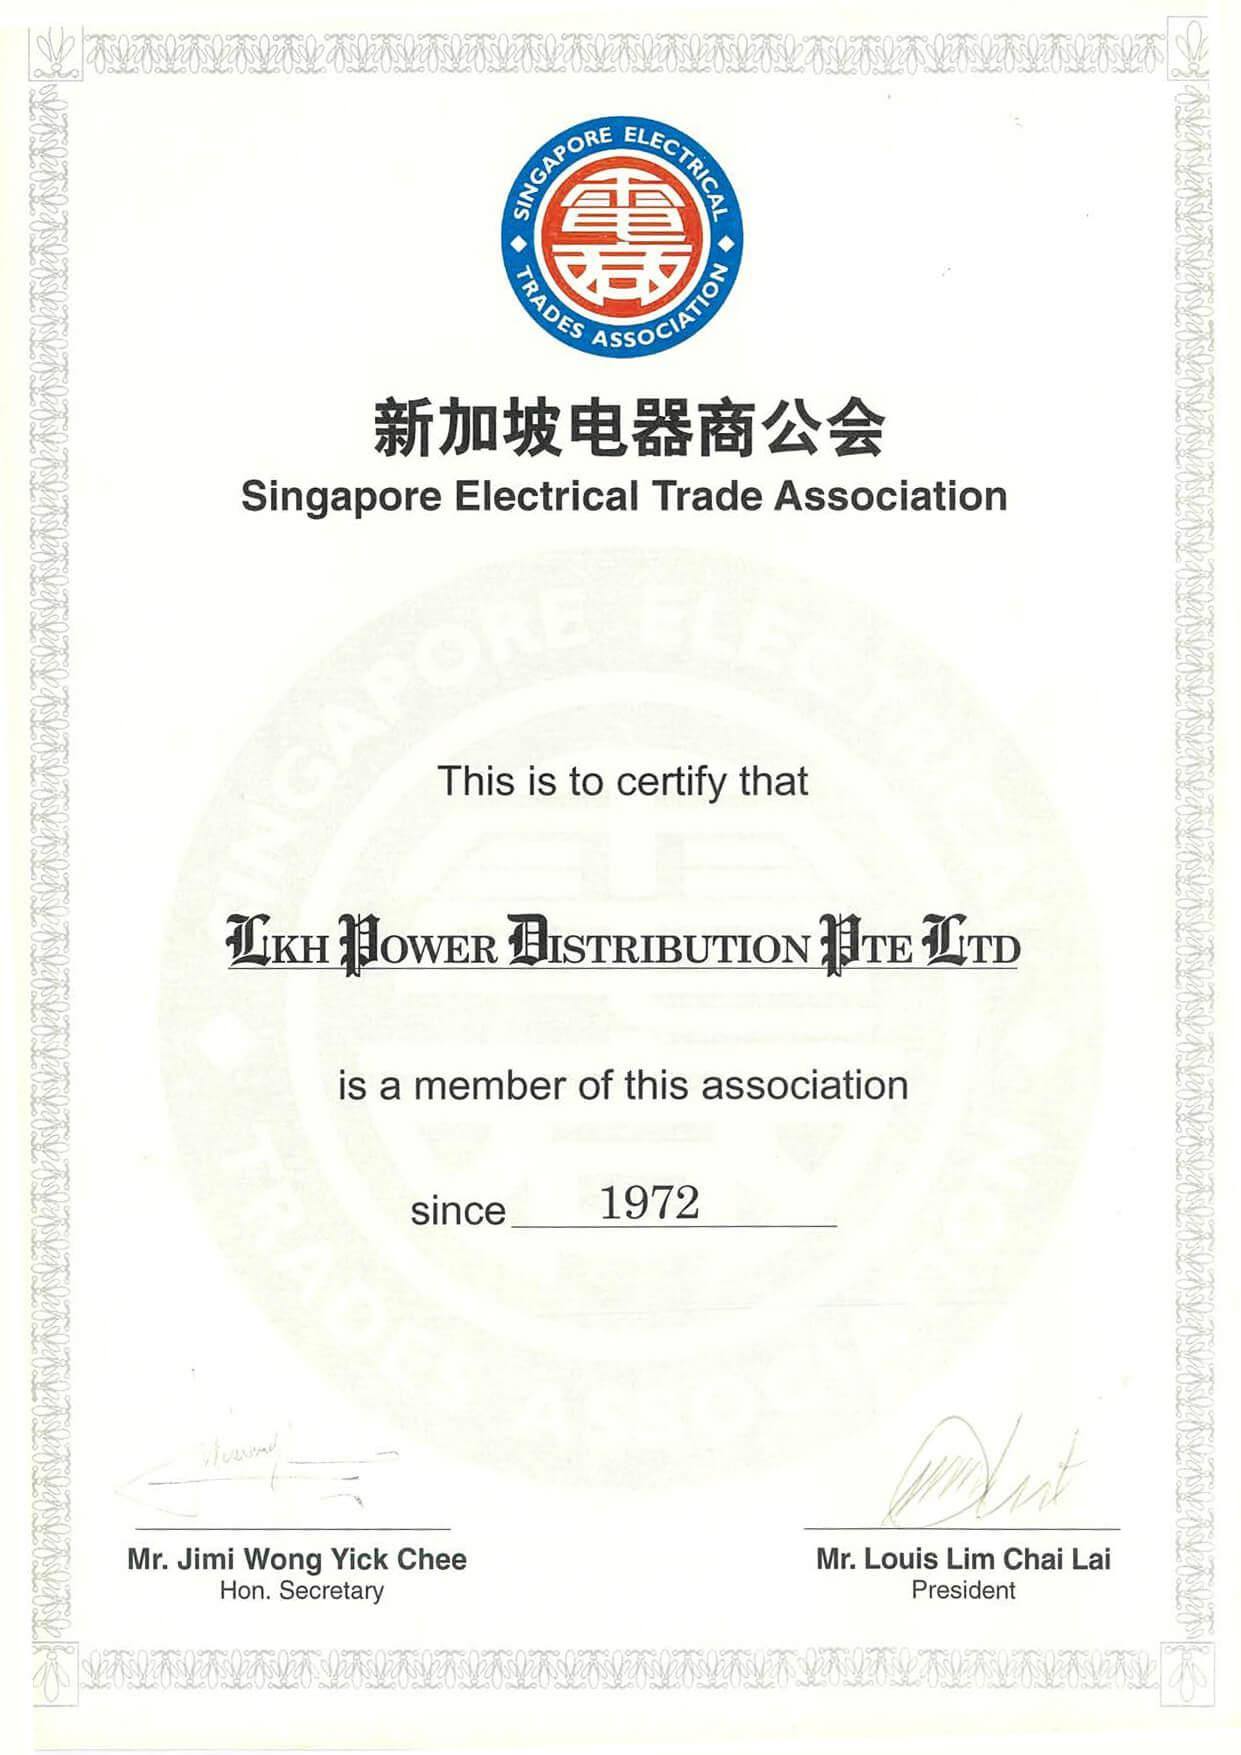 Singapore Electrical Trade Association - lkhpd